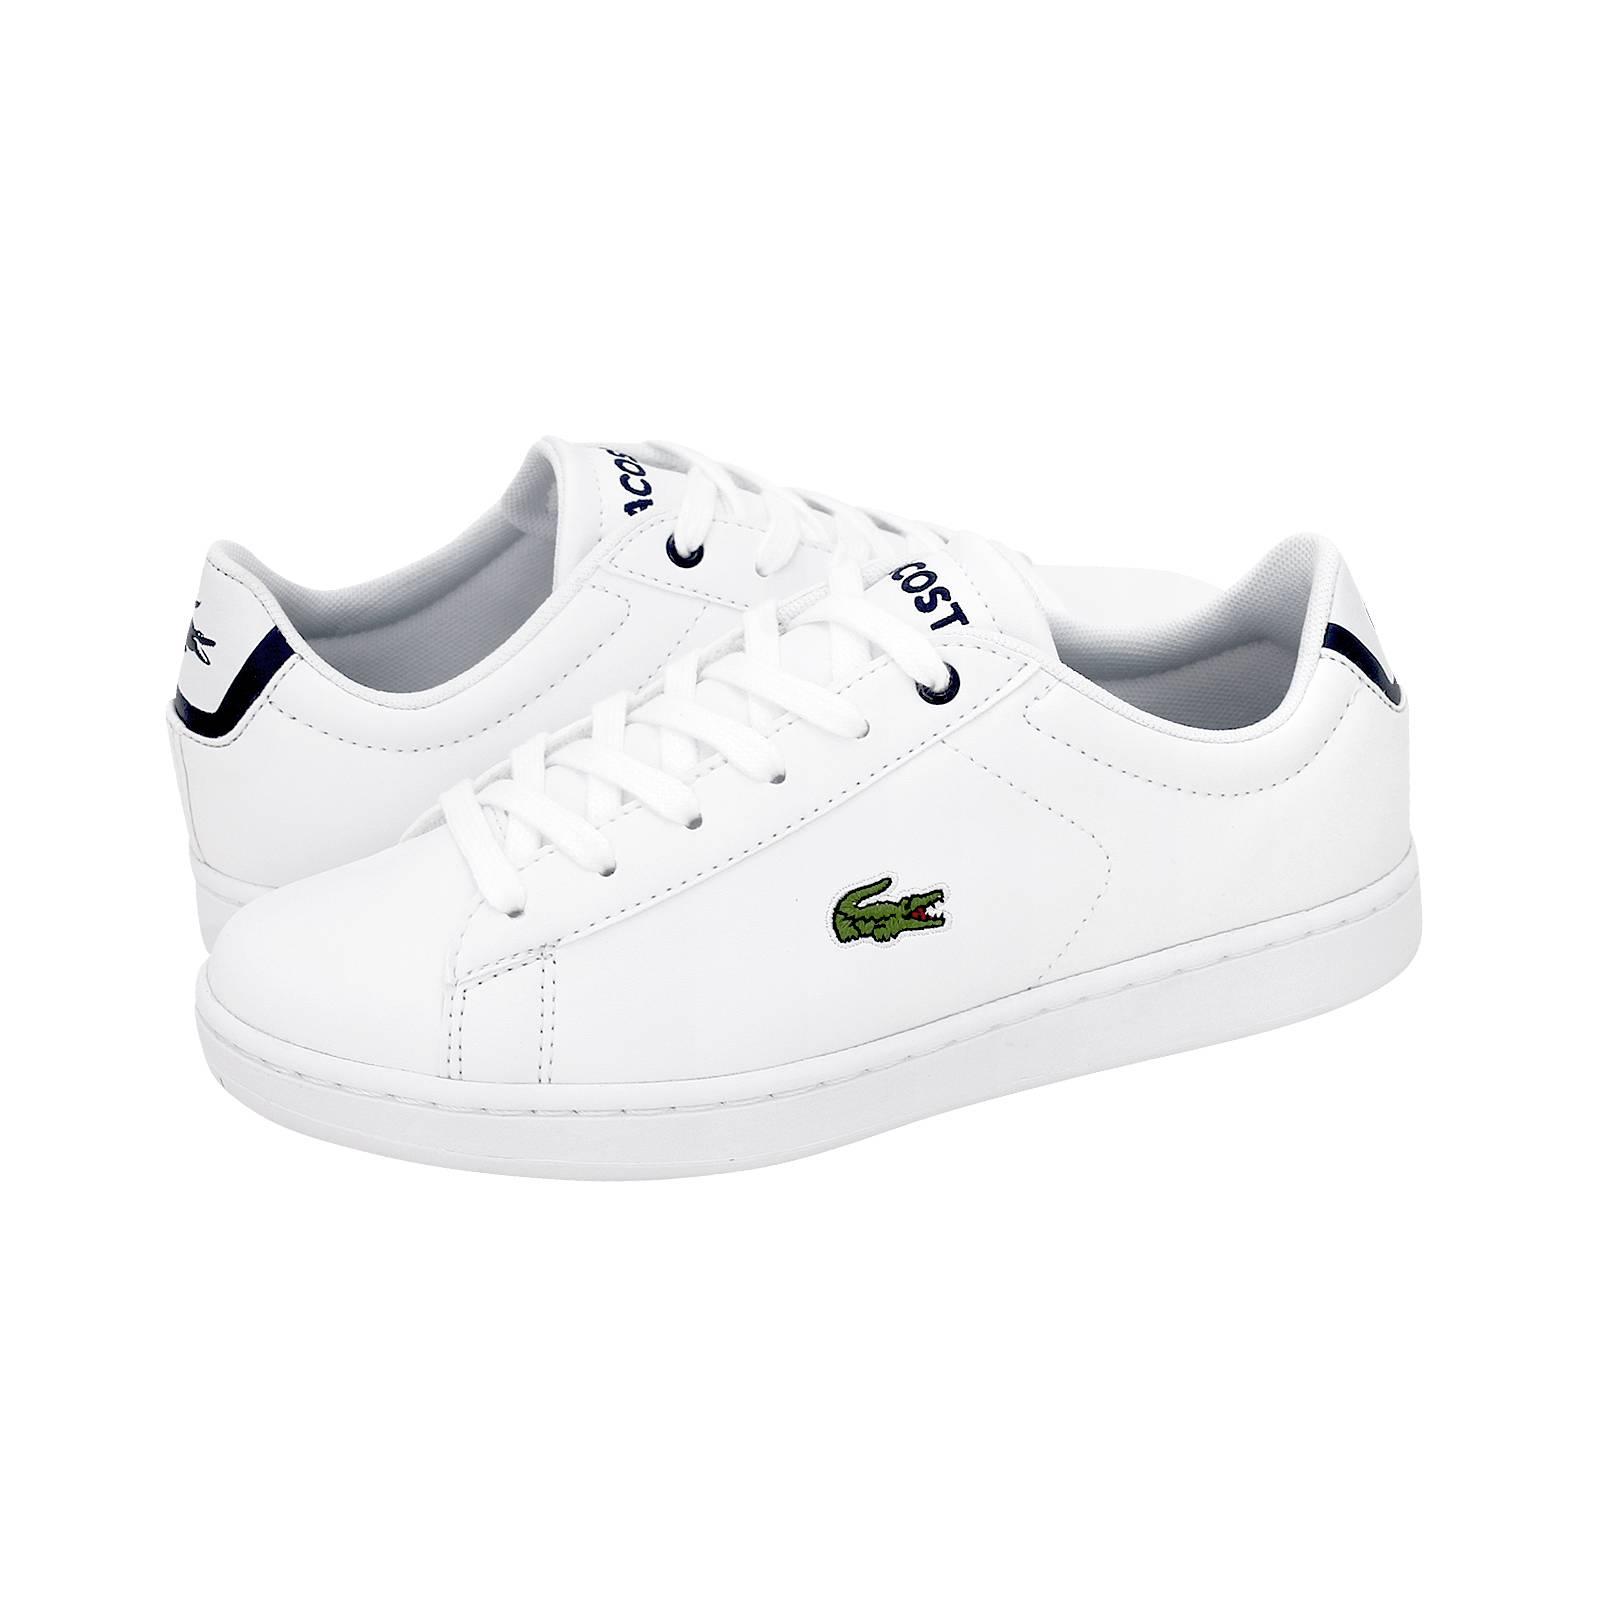 424f6d721e1 Carnaby Evo BL 1 S - Παιδικά παπούτσια casual Lacoste από δερμα ...